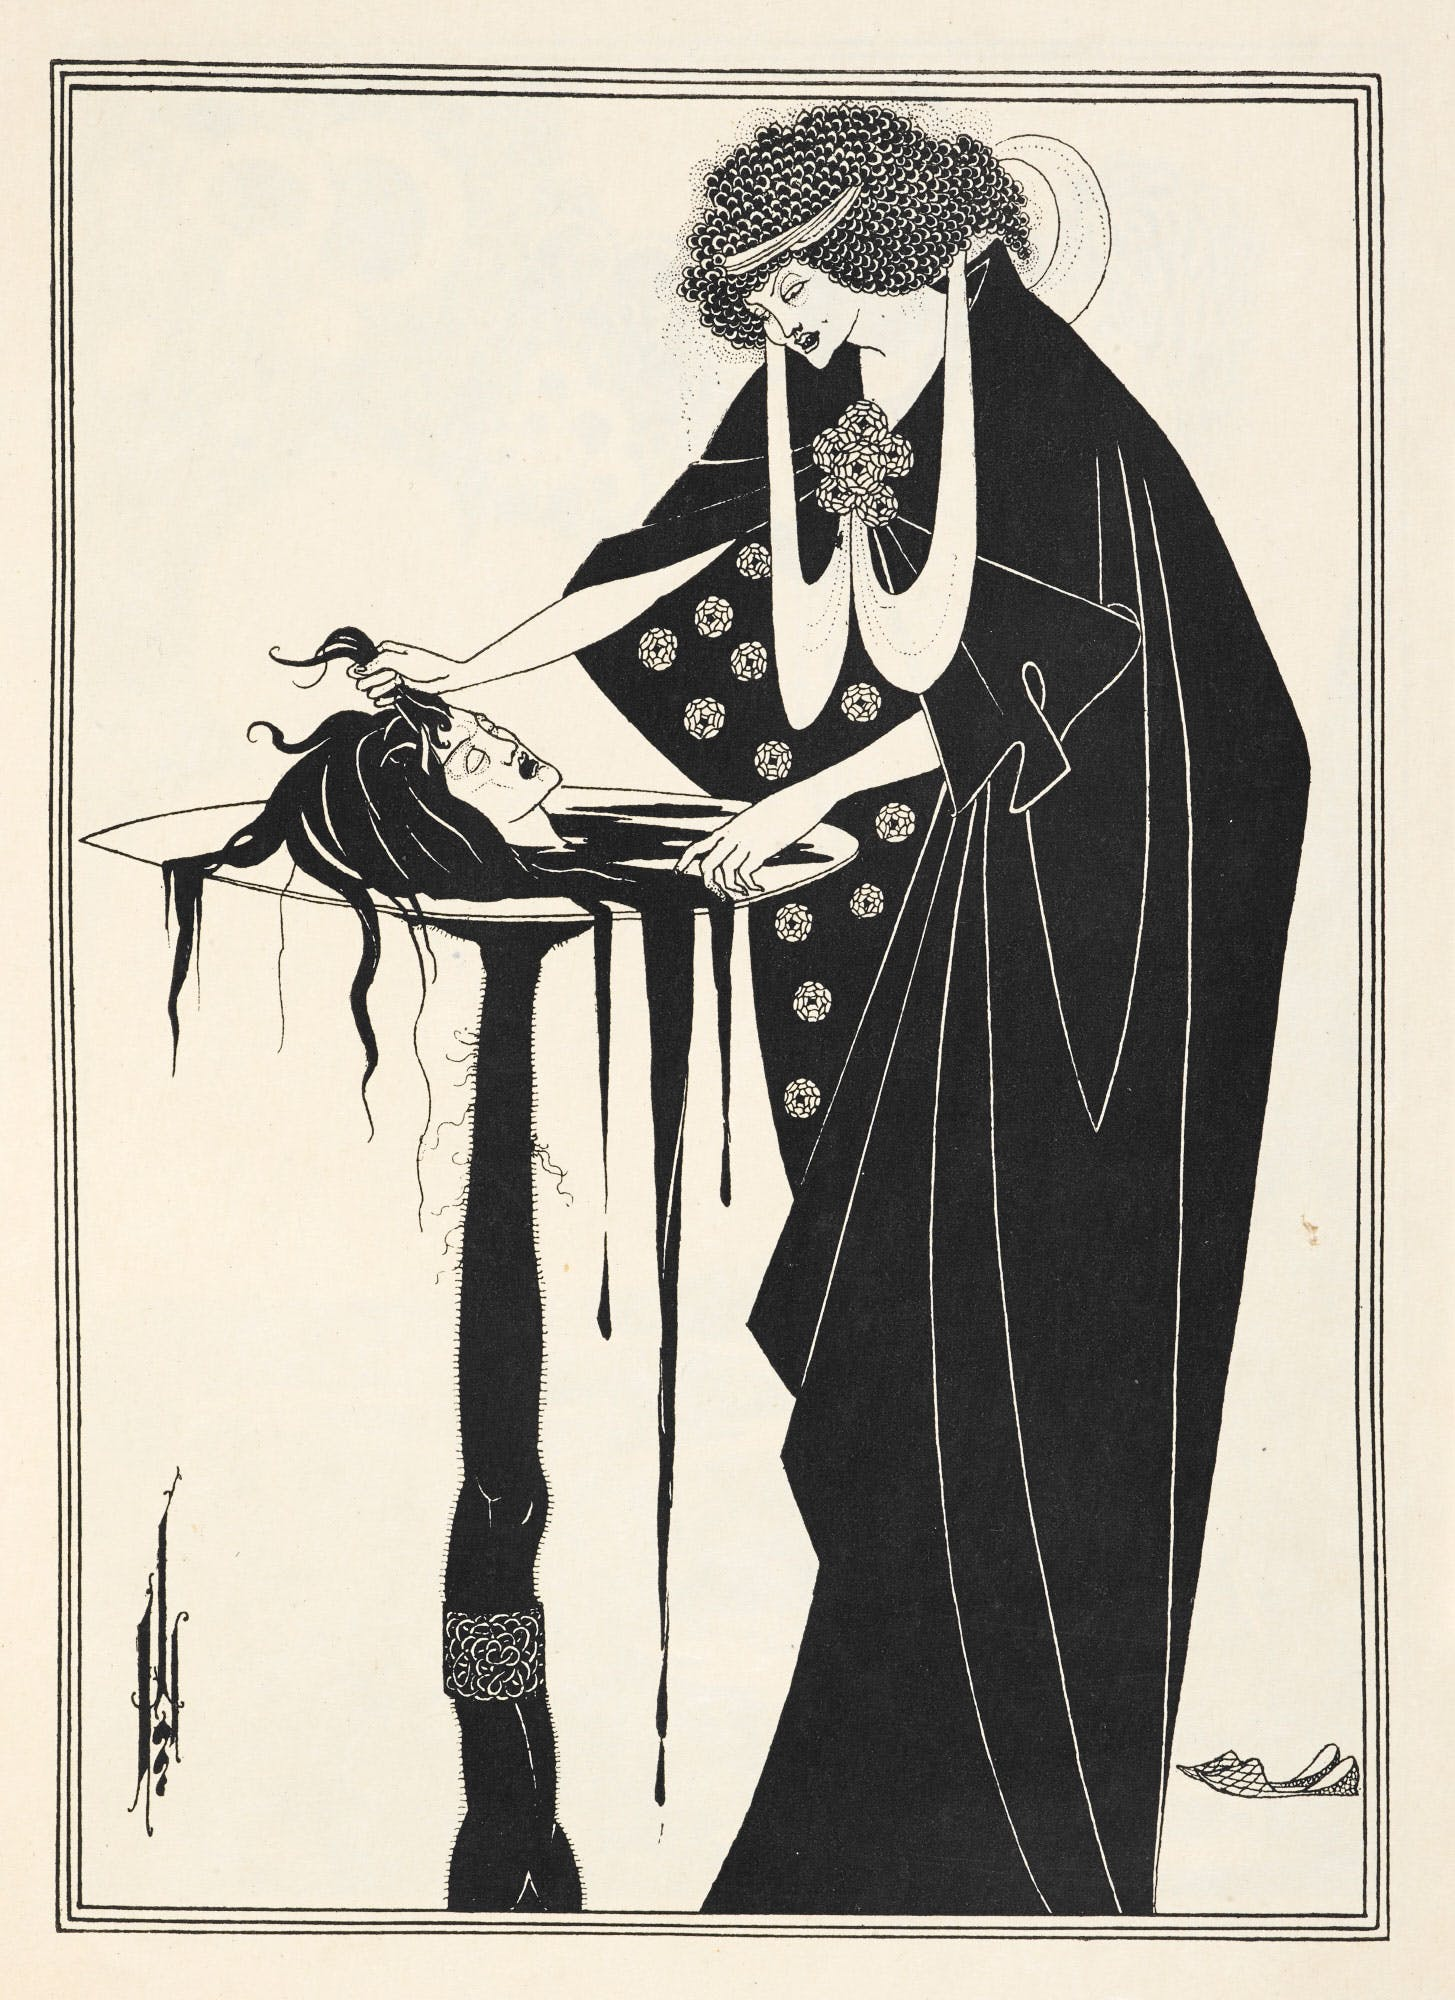 aubrey beardsley illustration 2